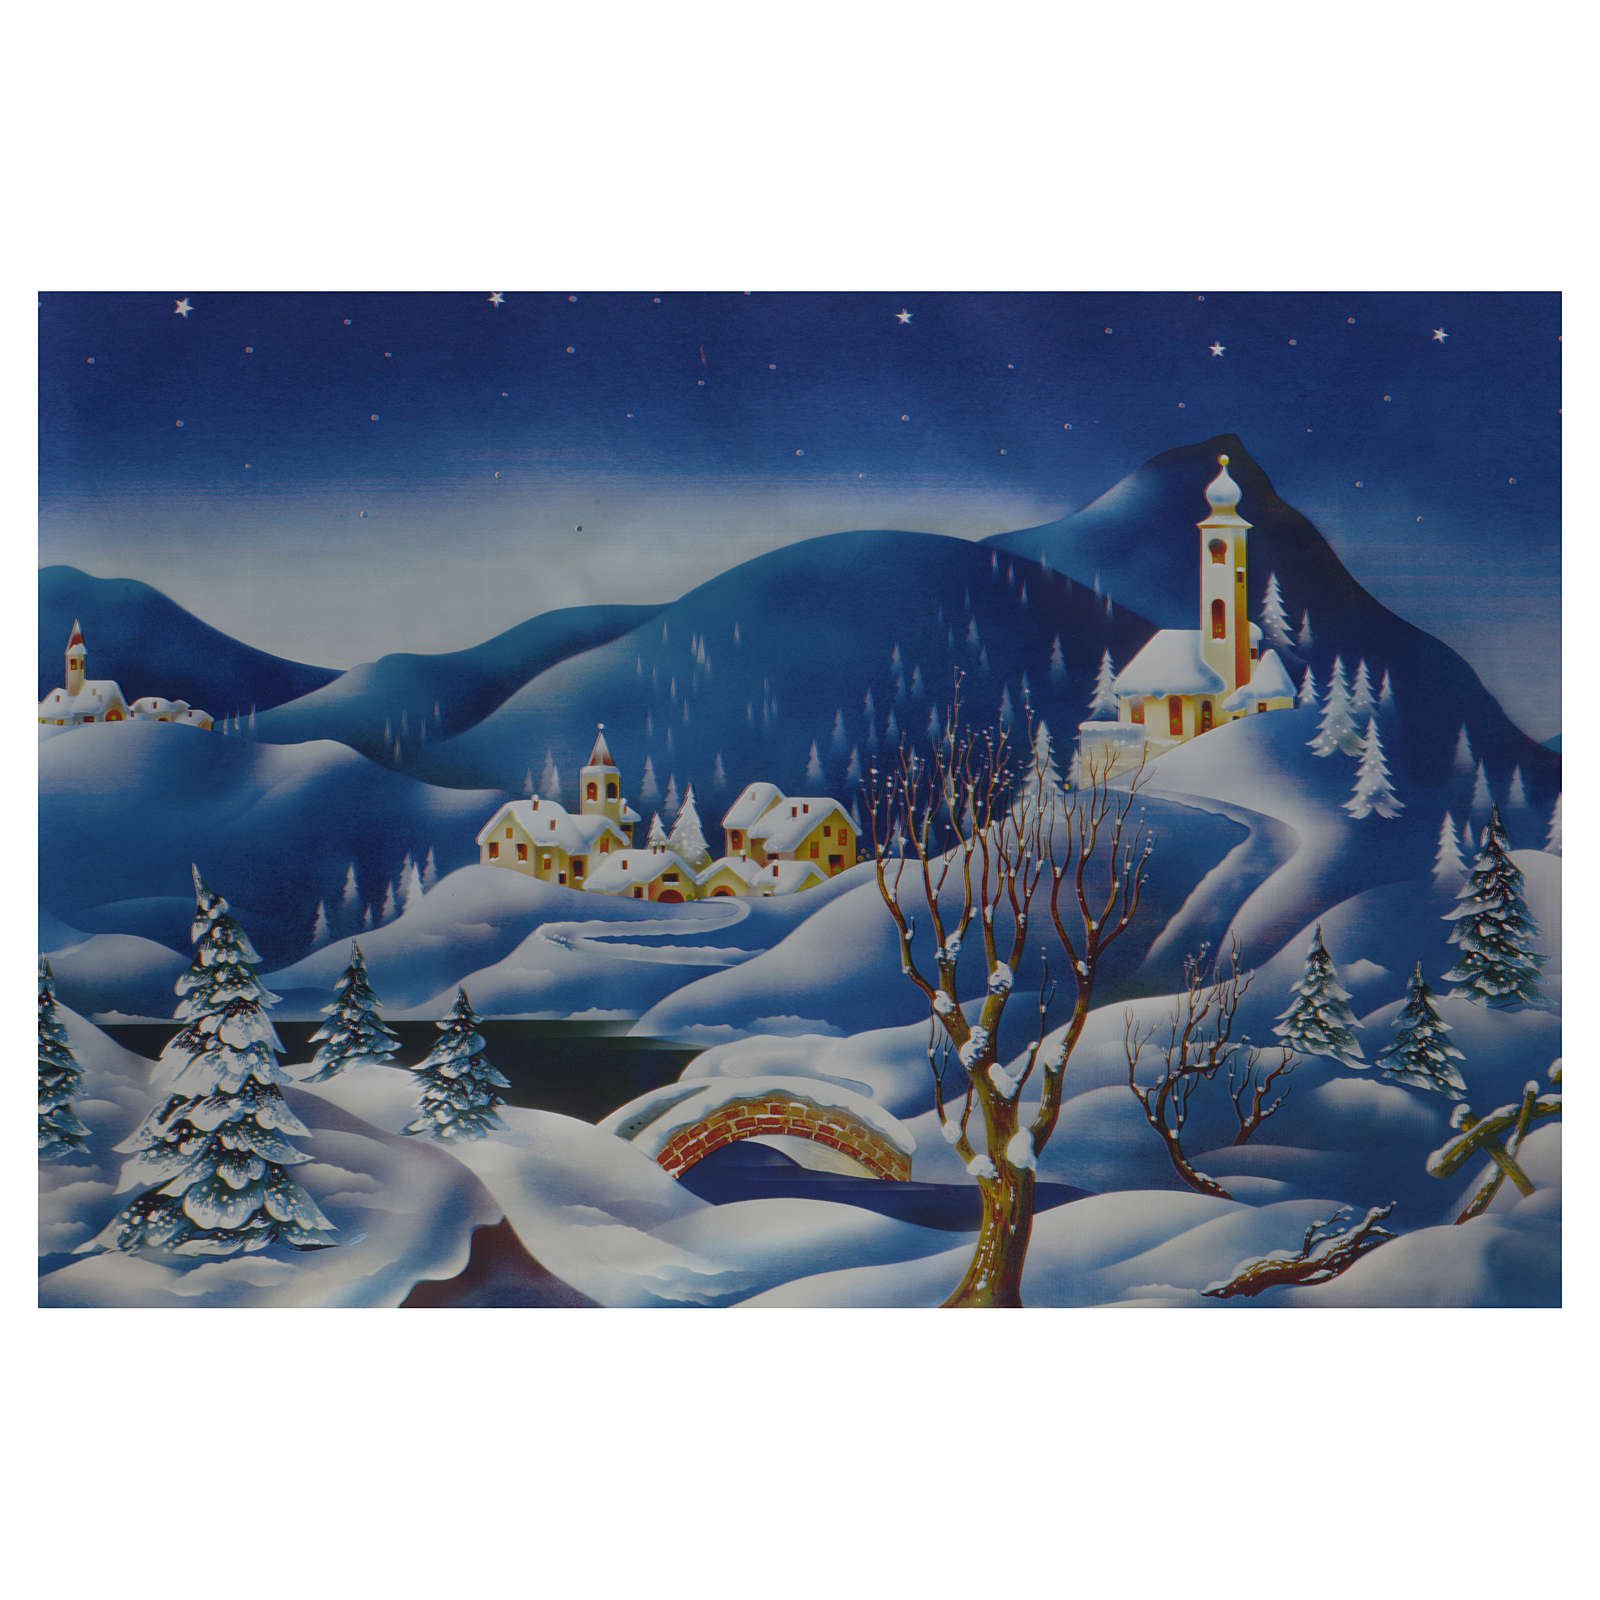 Rotolo fondale invernale 70x100 cm presepe 4